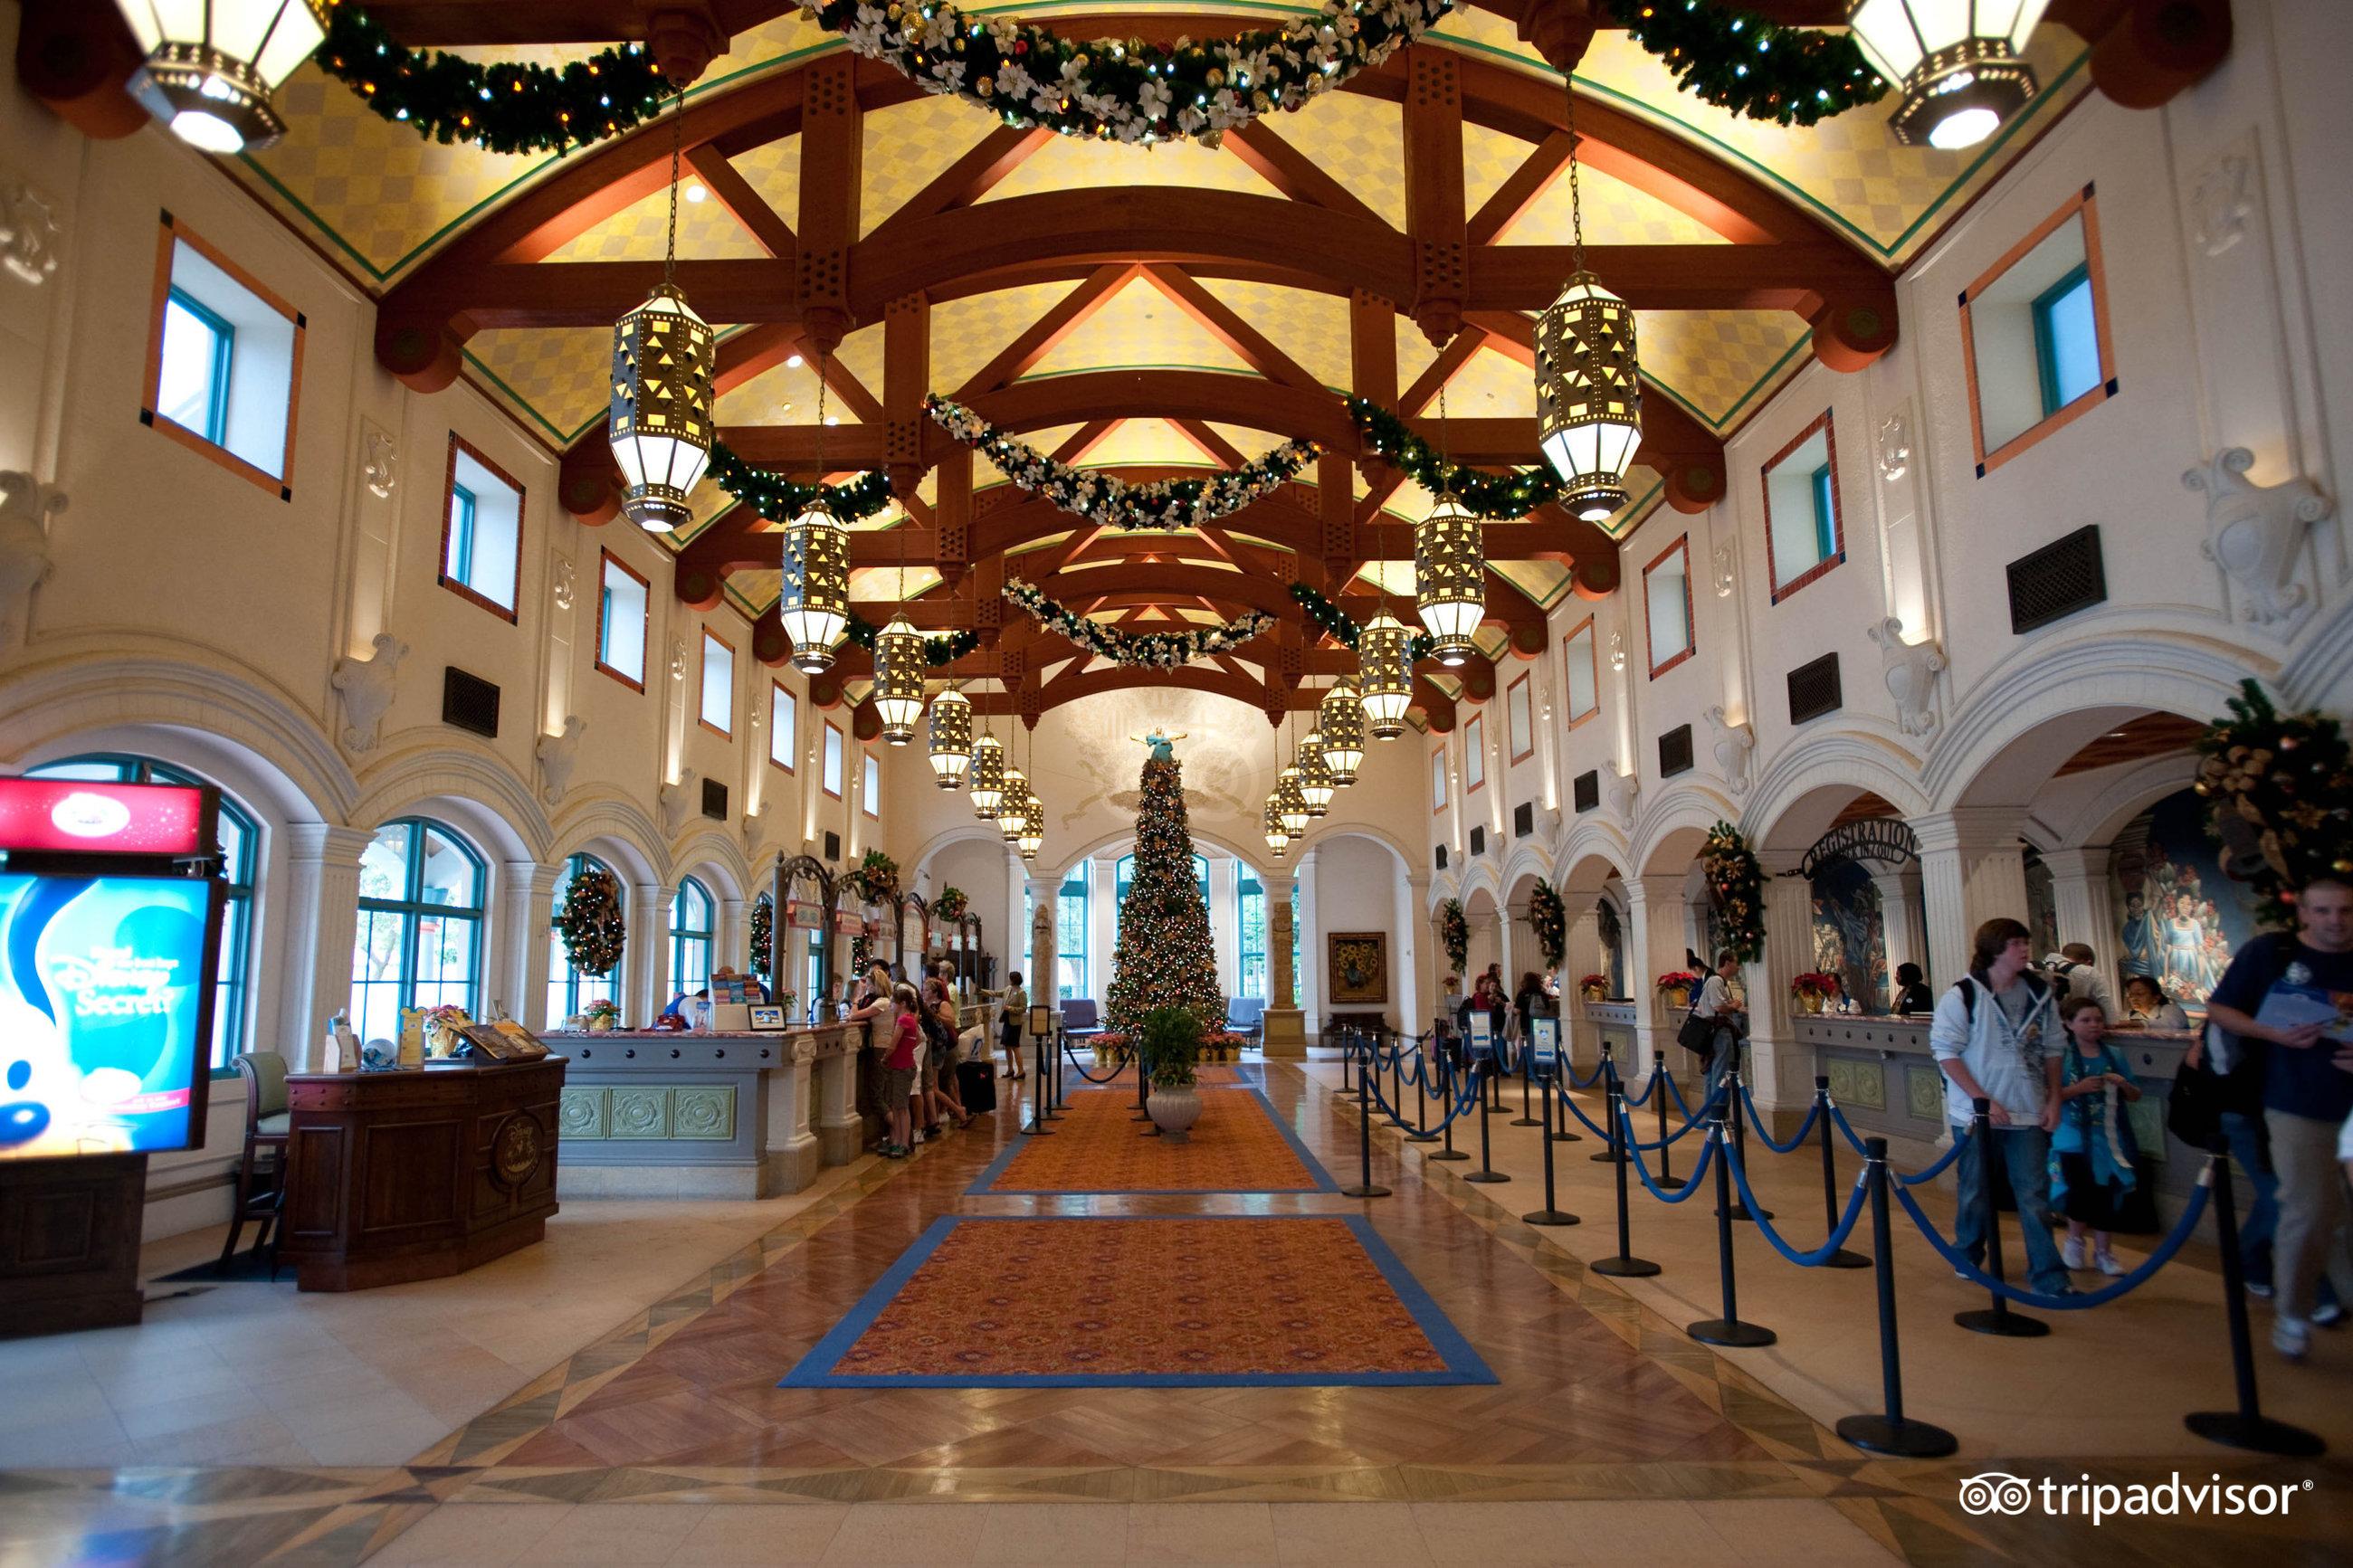 Disneys Coronado Springs Resort Room Prices : lobby v660715 from www.familyvacationcritic.com size 2600 x 1733 jpeg 973kB